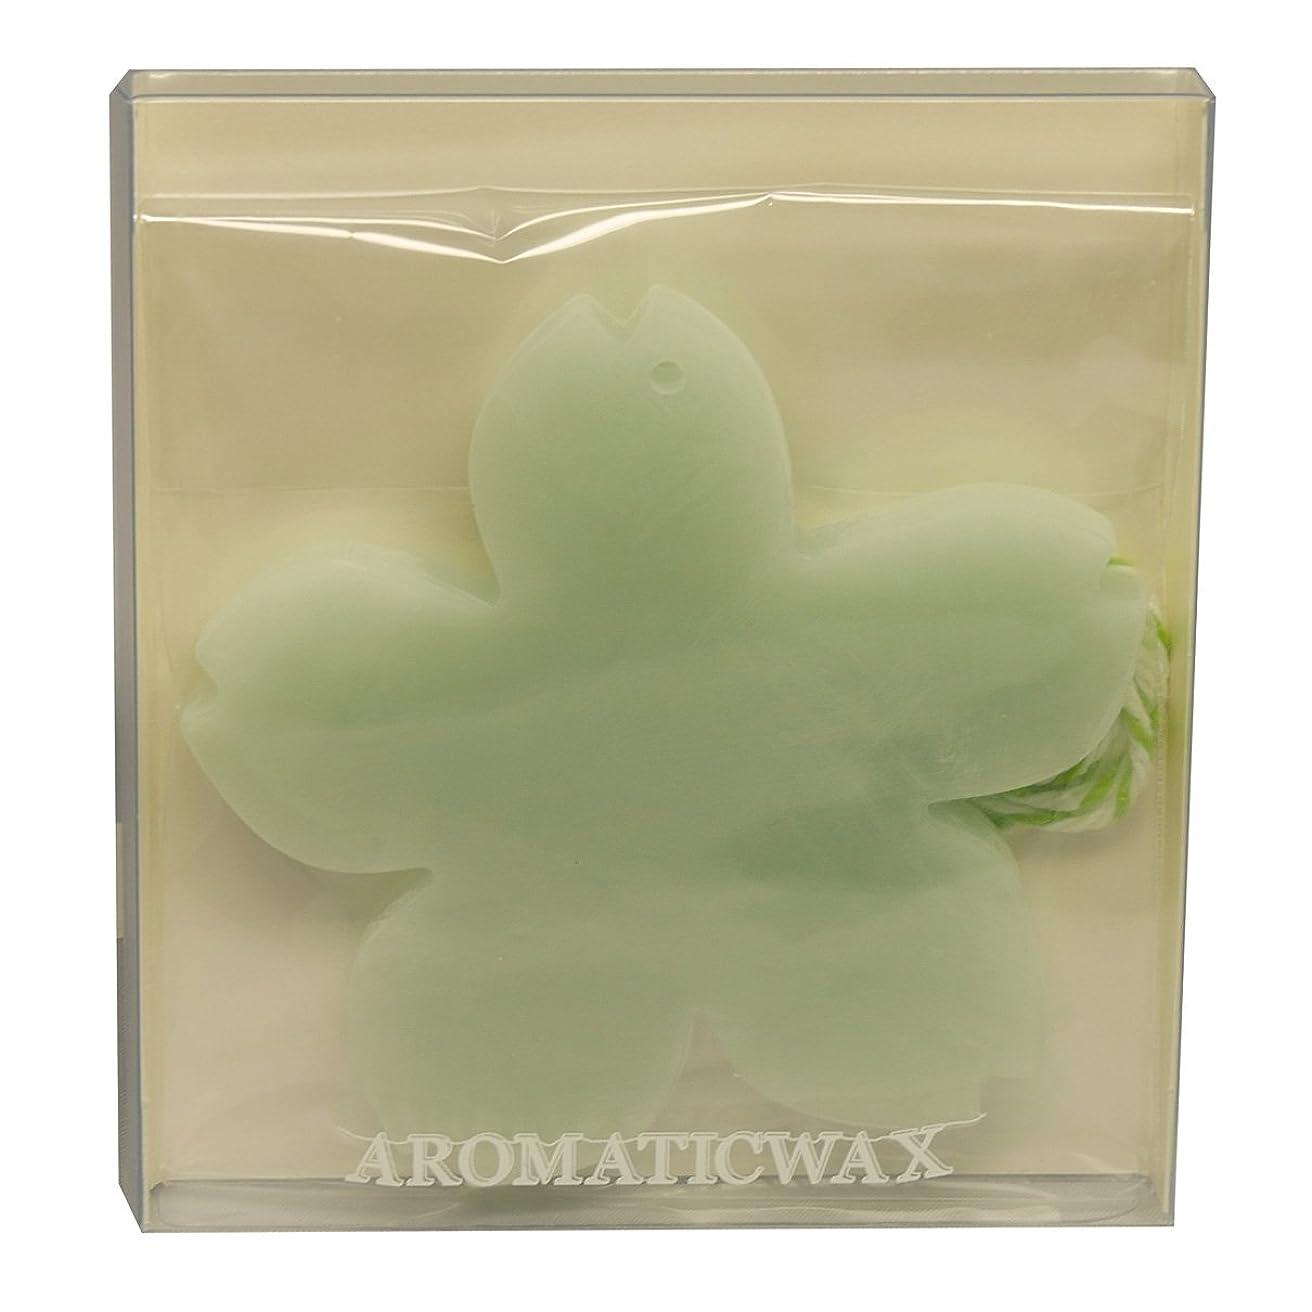 GRASSE TOKYO AROMATICWAXチャーム「さくら」(GR) レモングラス アロマティックワックス グラーストウキョウ